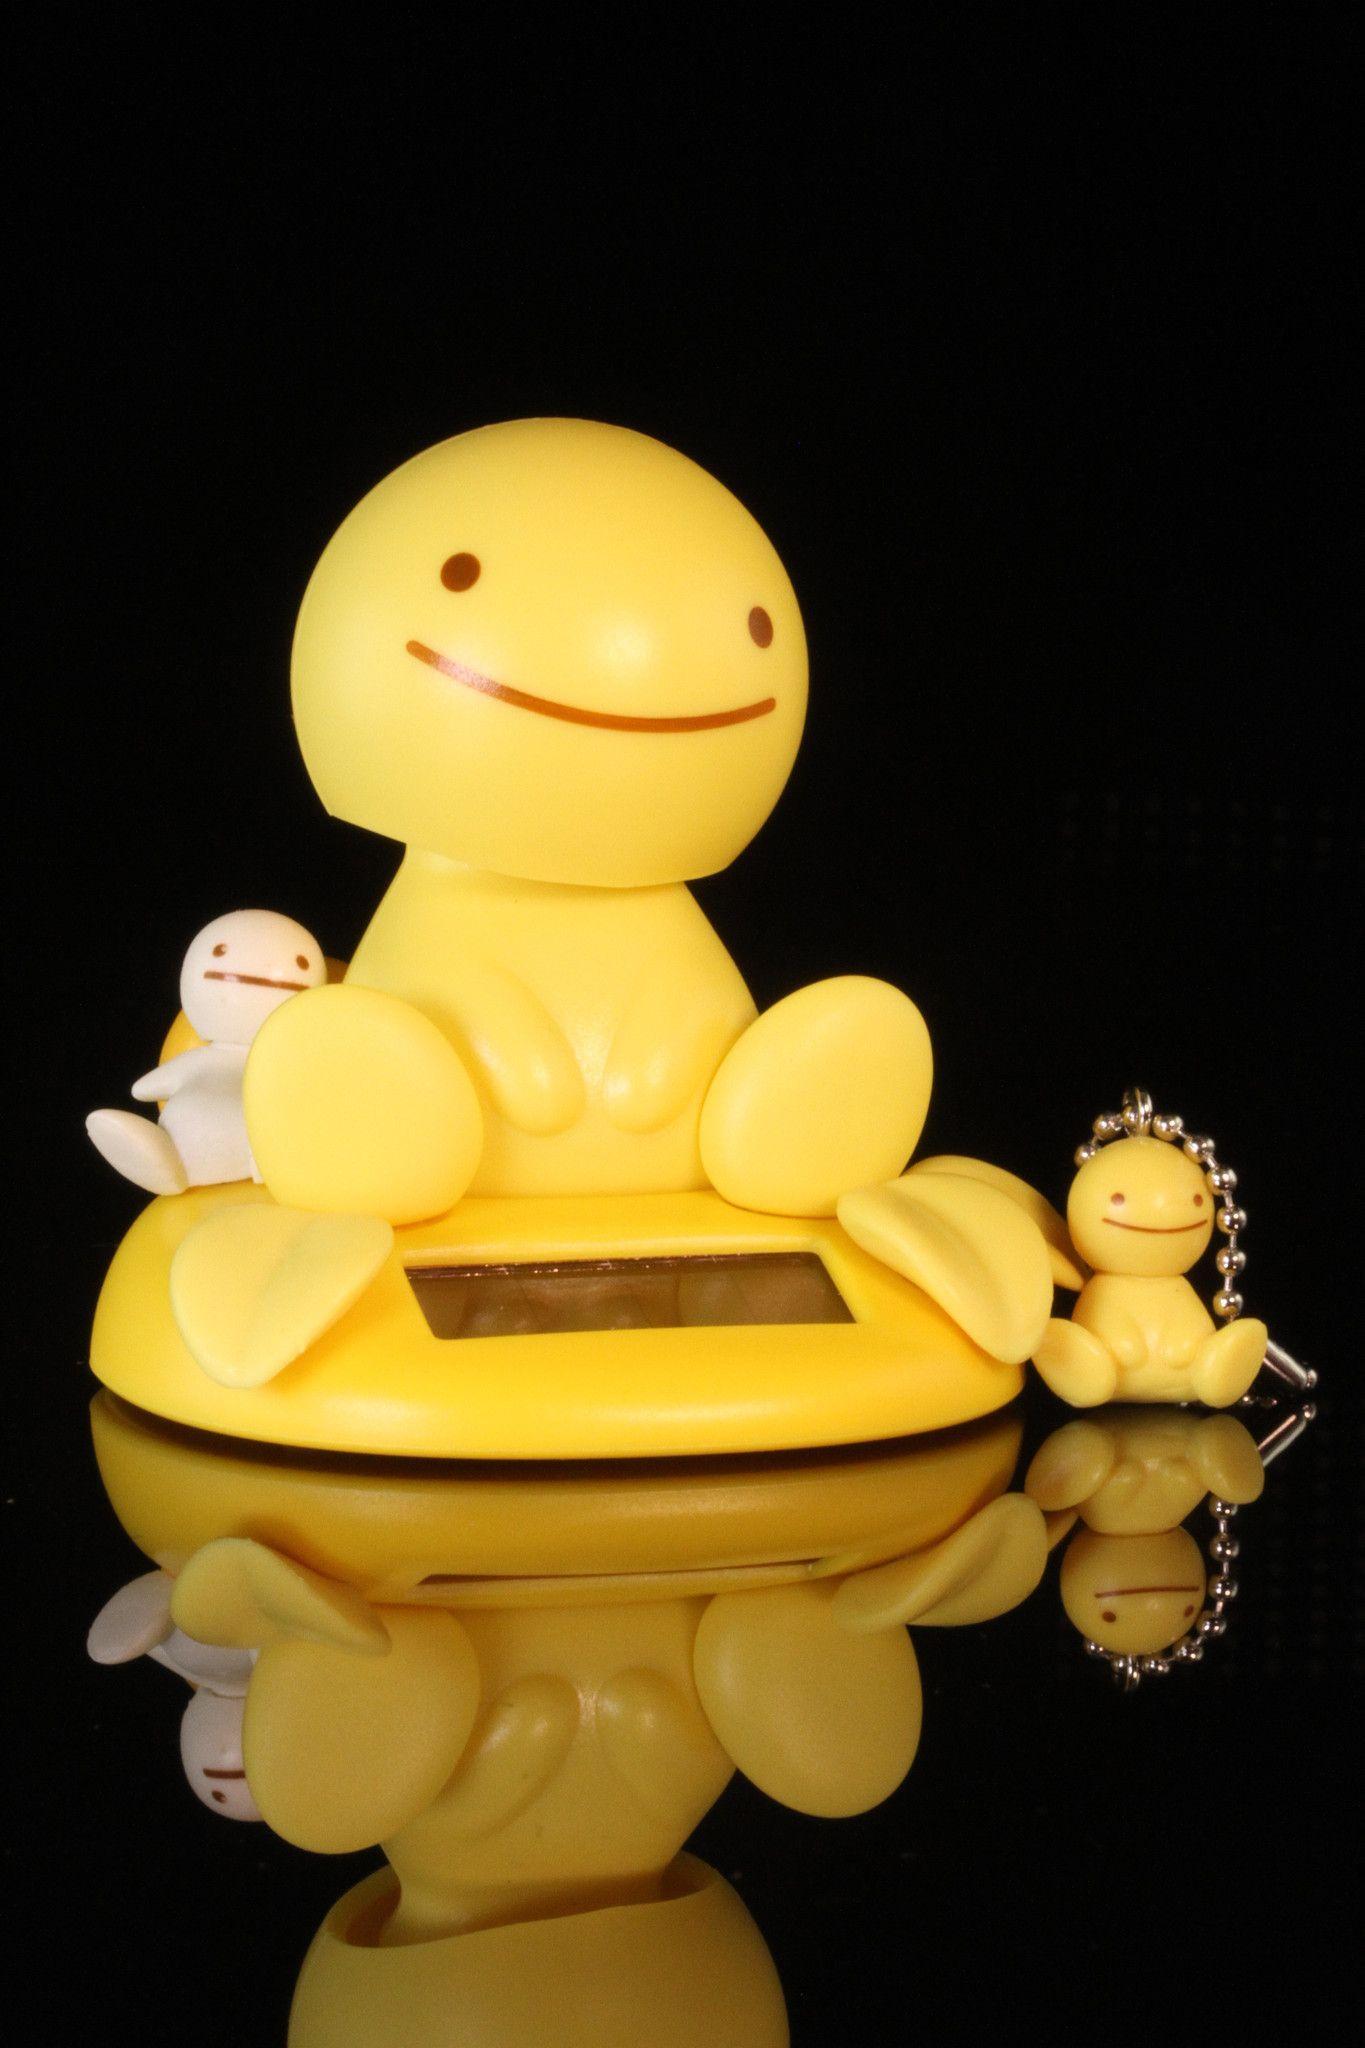 Yellow Smiley Face Bobble Head Yellow Smiley Face Smiley Face Bobble Head